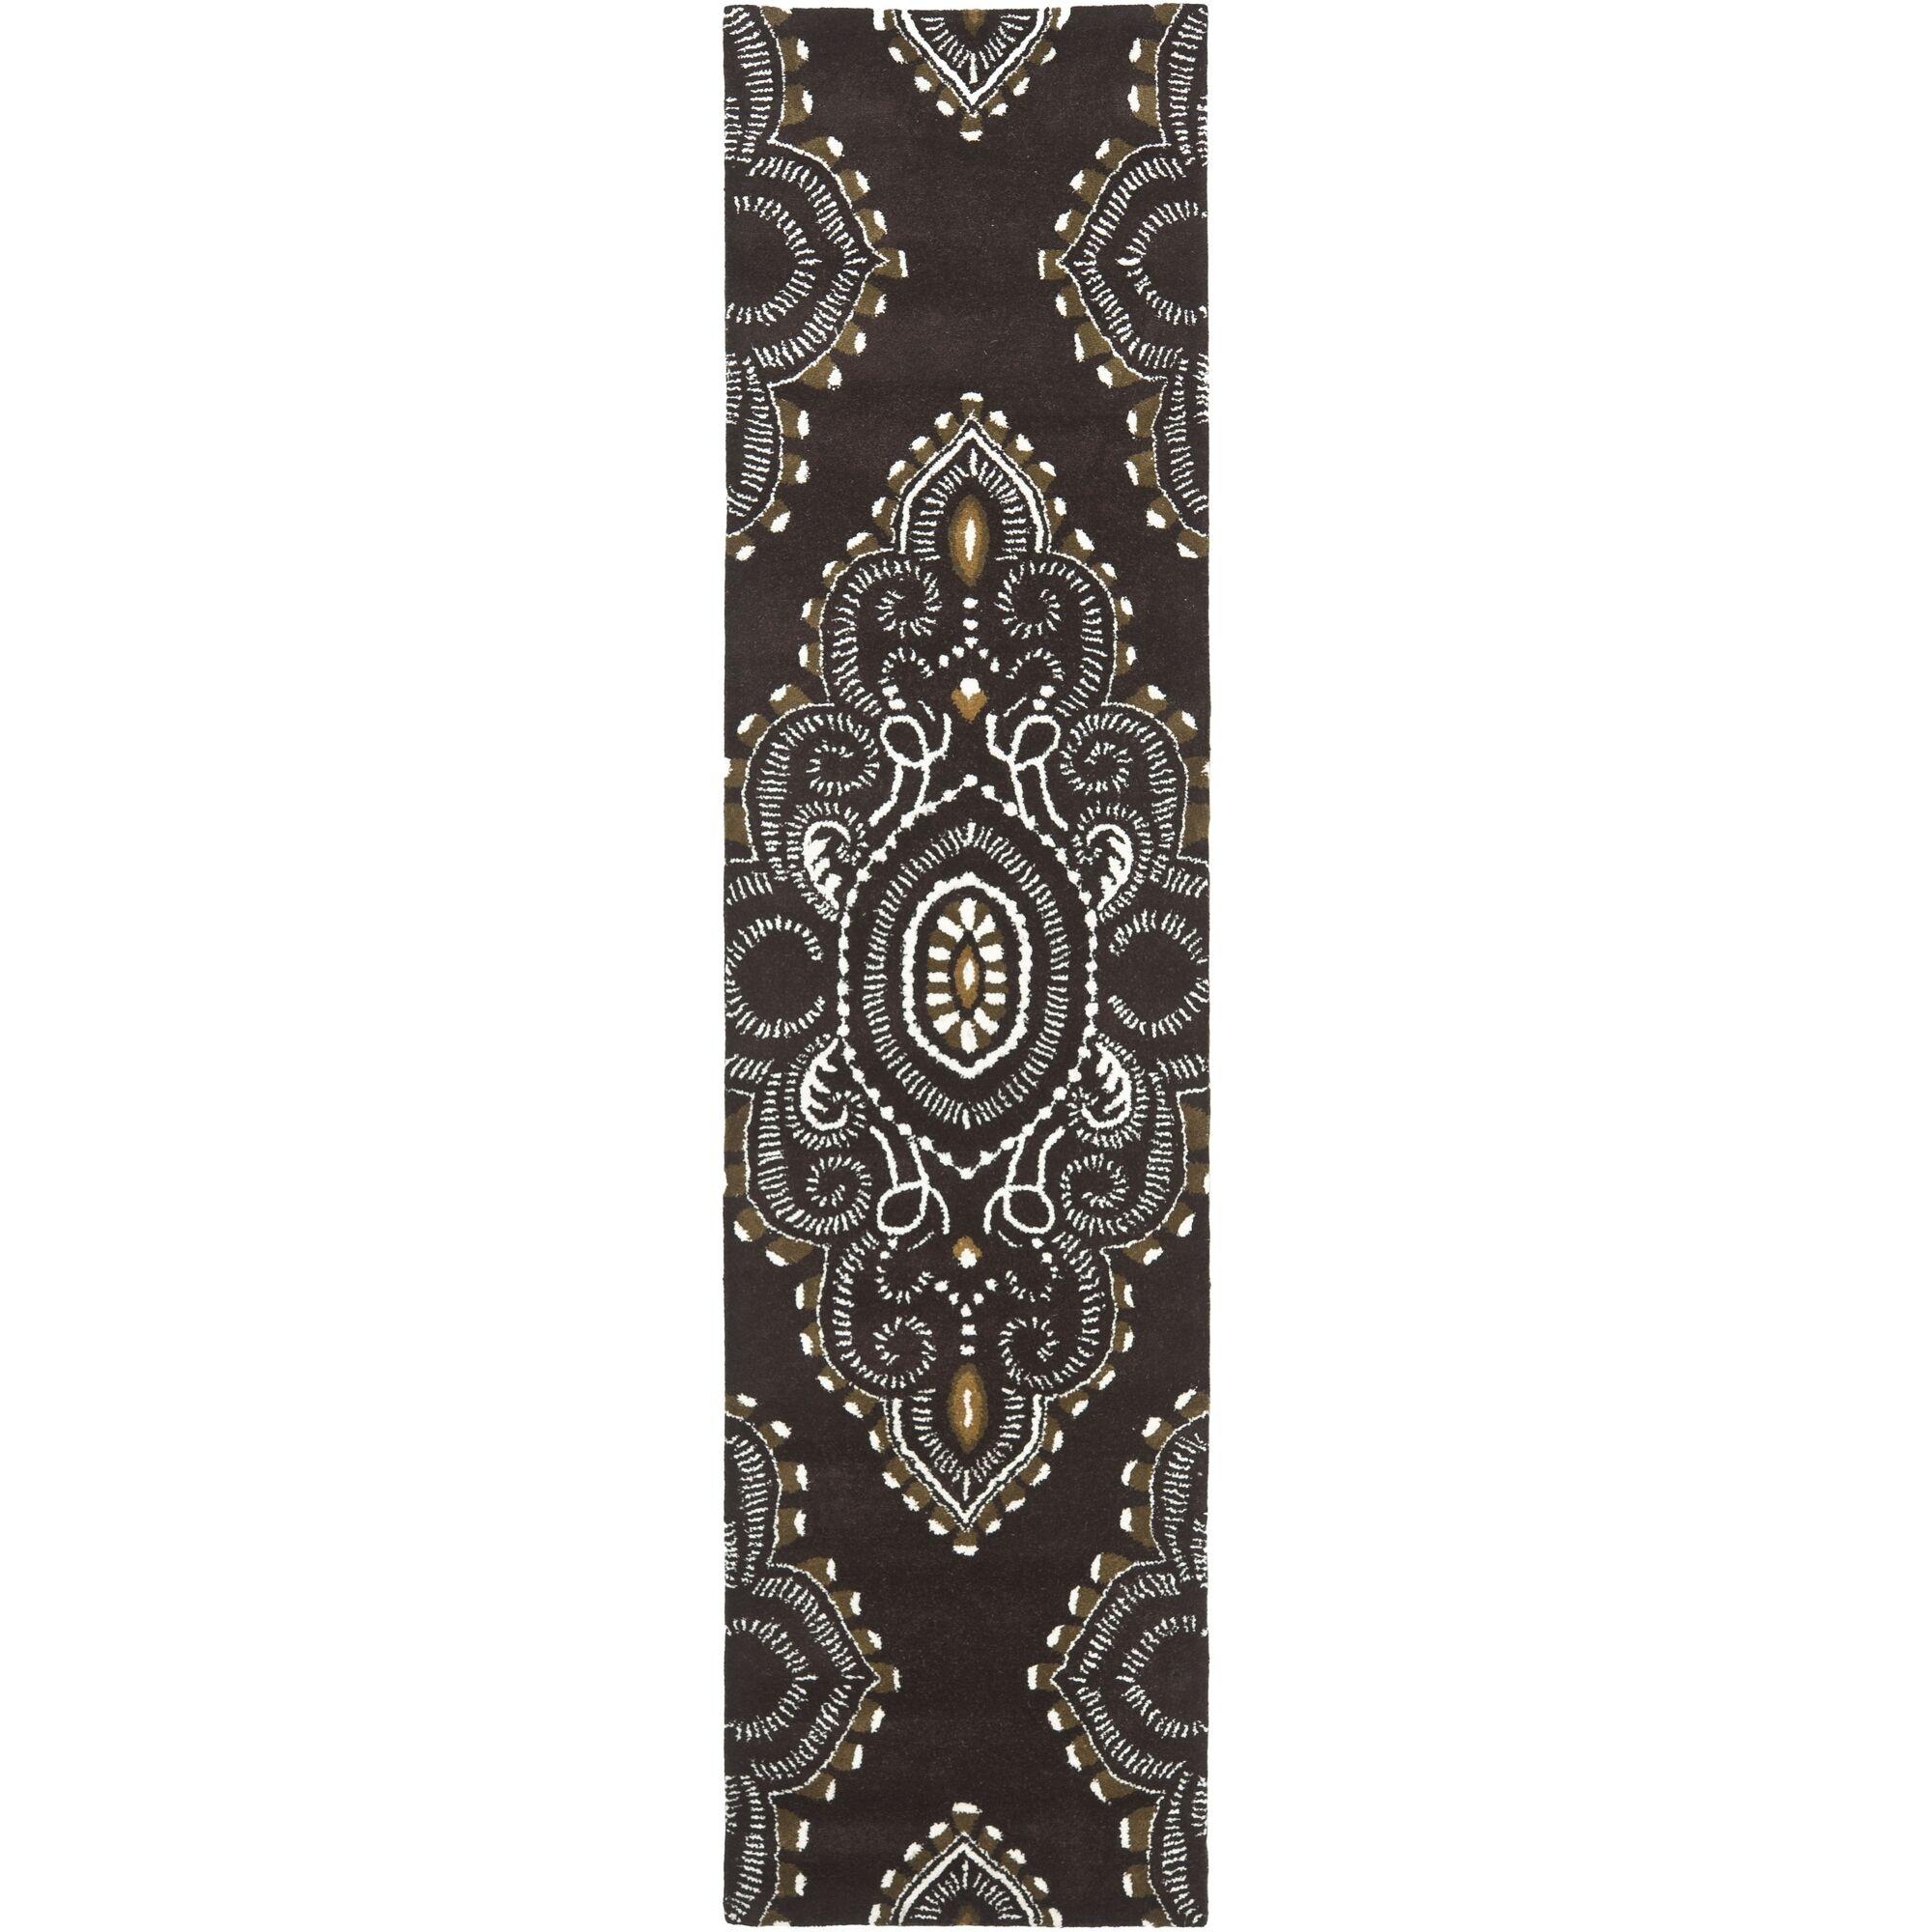 Kouerga Brown / Ivory Rug Rug Size: Rectangle 8' x 10'